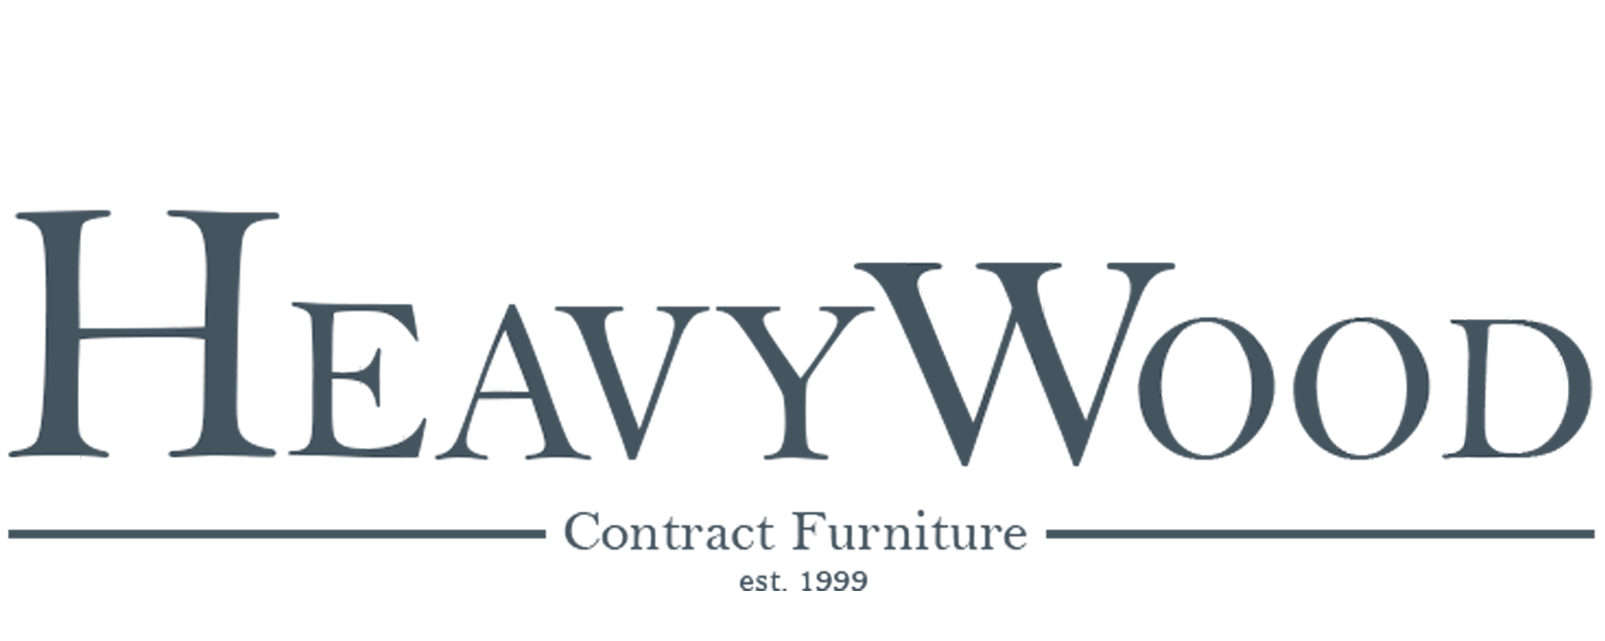 Heavywood Logo.png